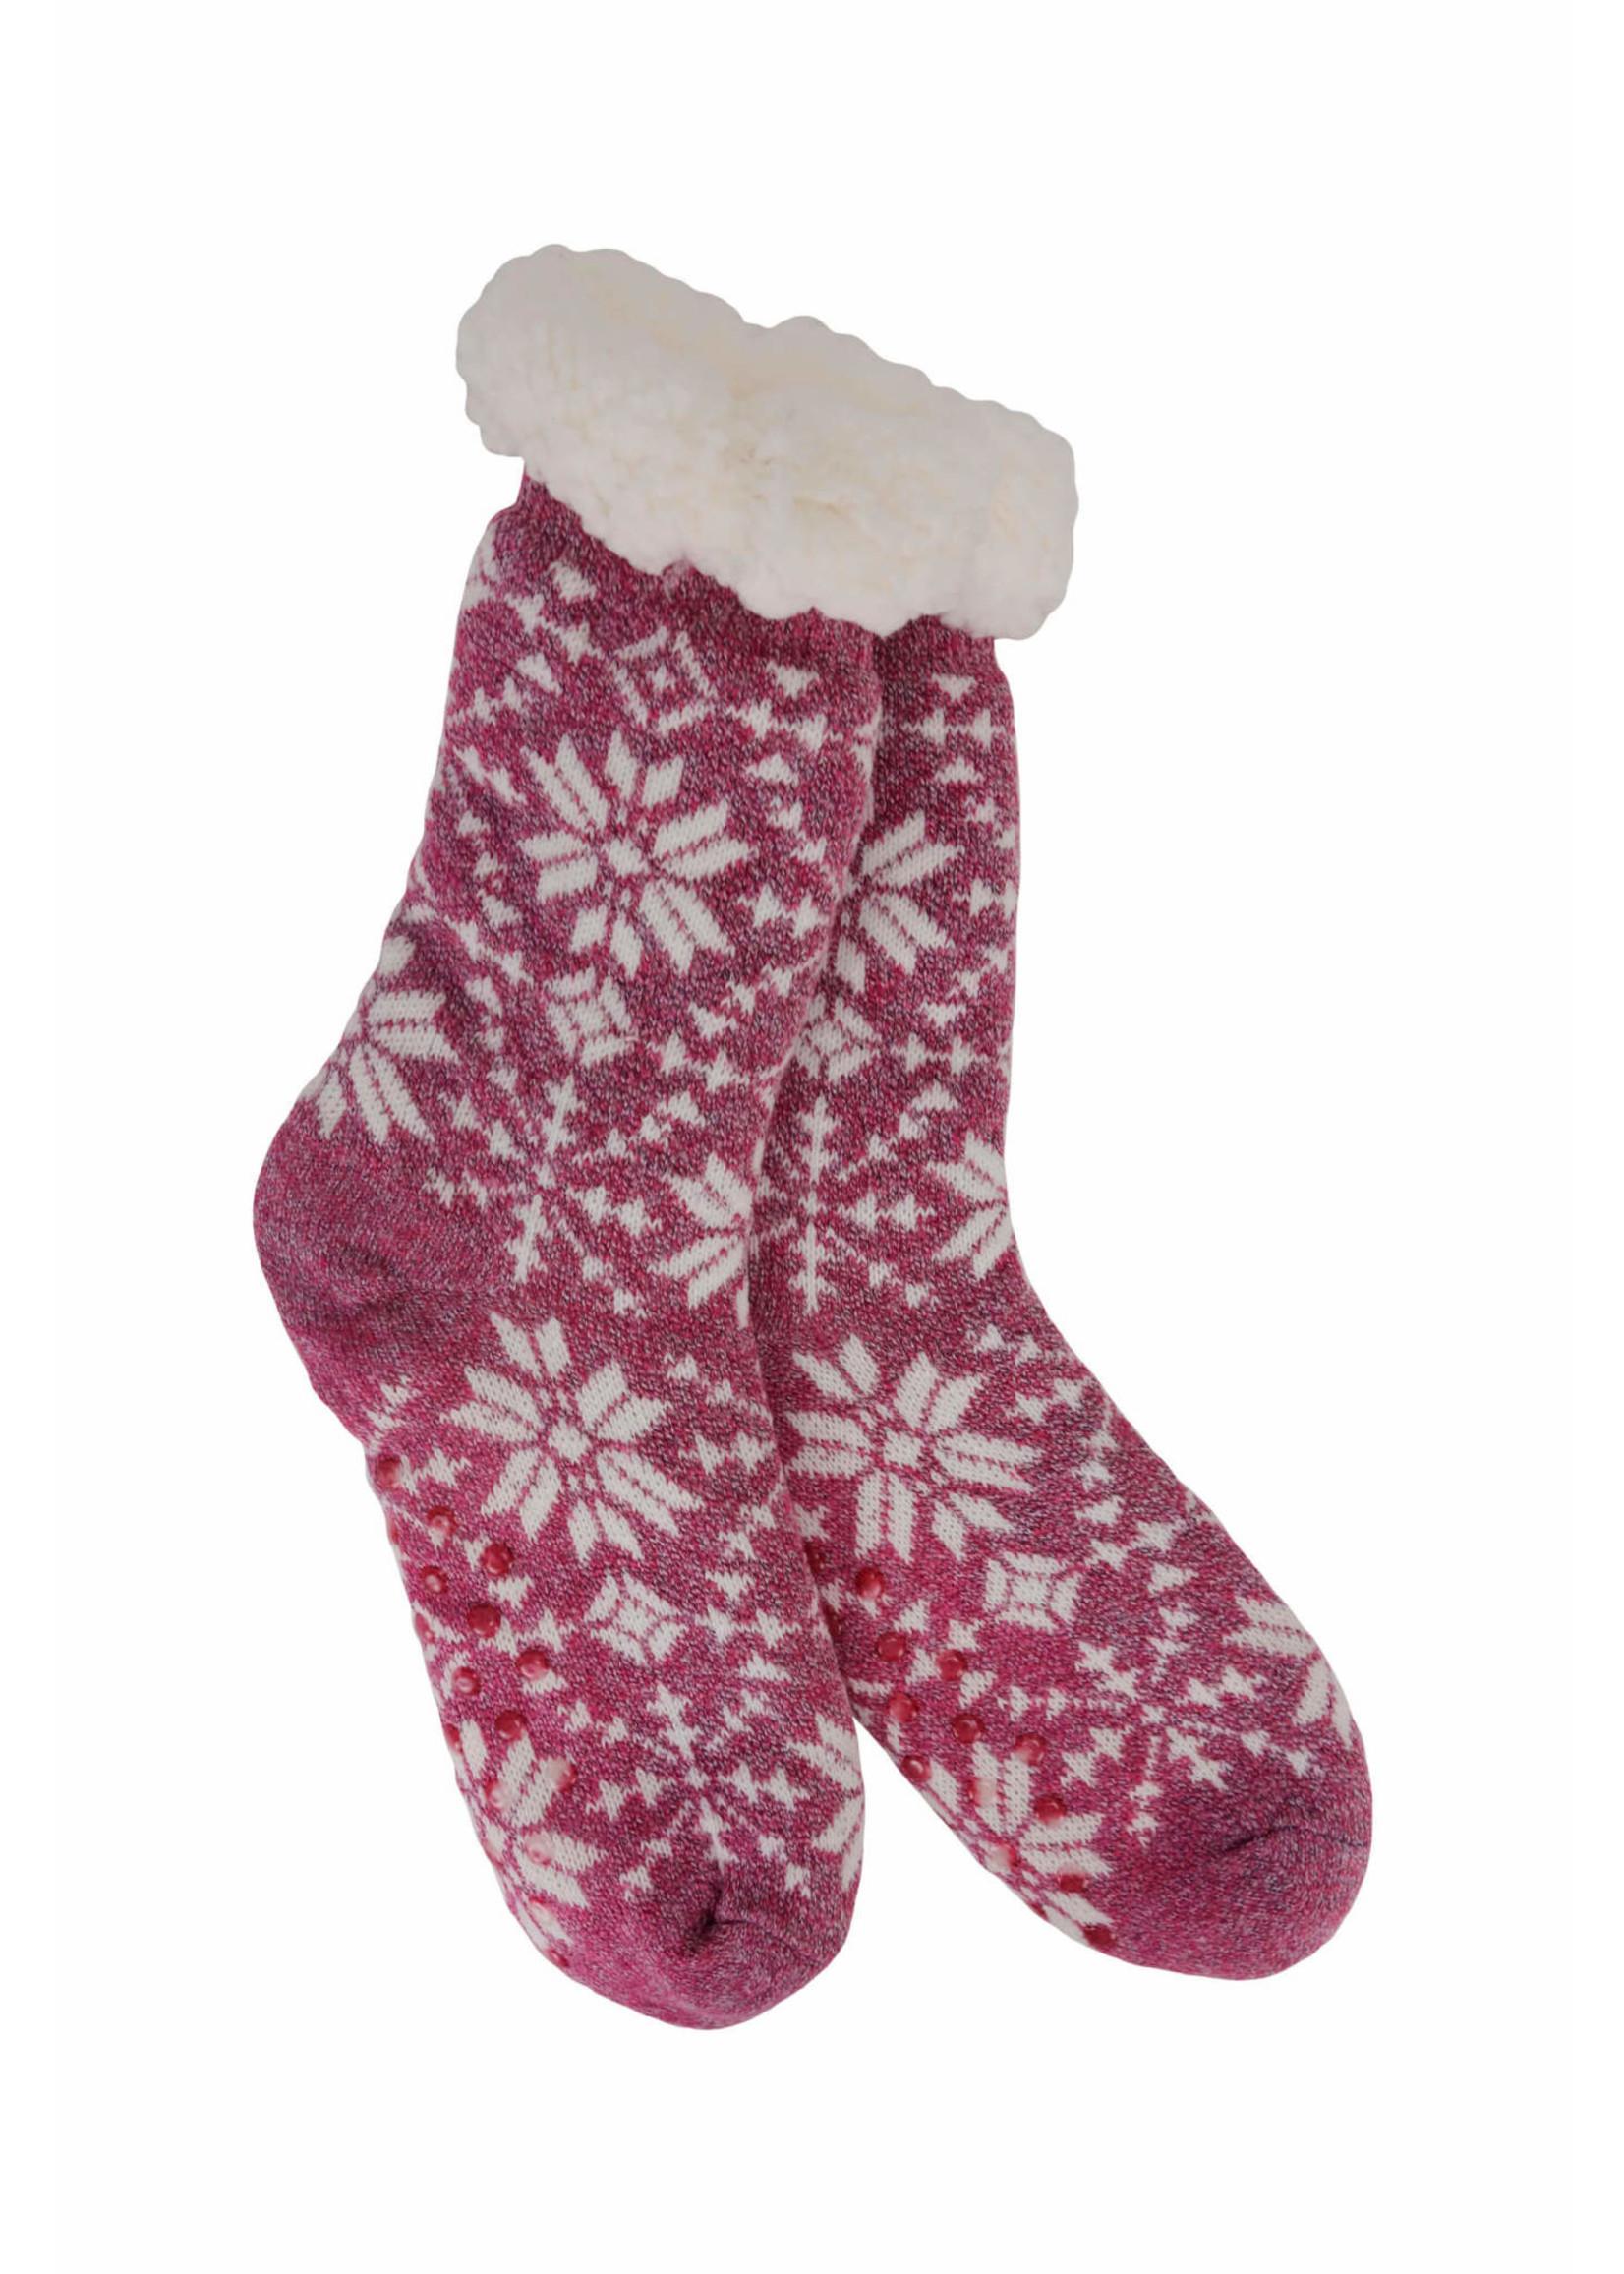 Fashion by Mirabeau Heather Blend Snowflake Knit Thermal Slipper Socks